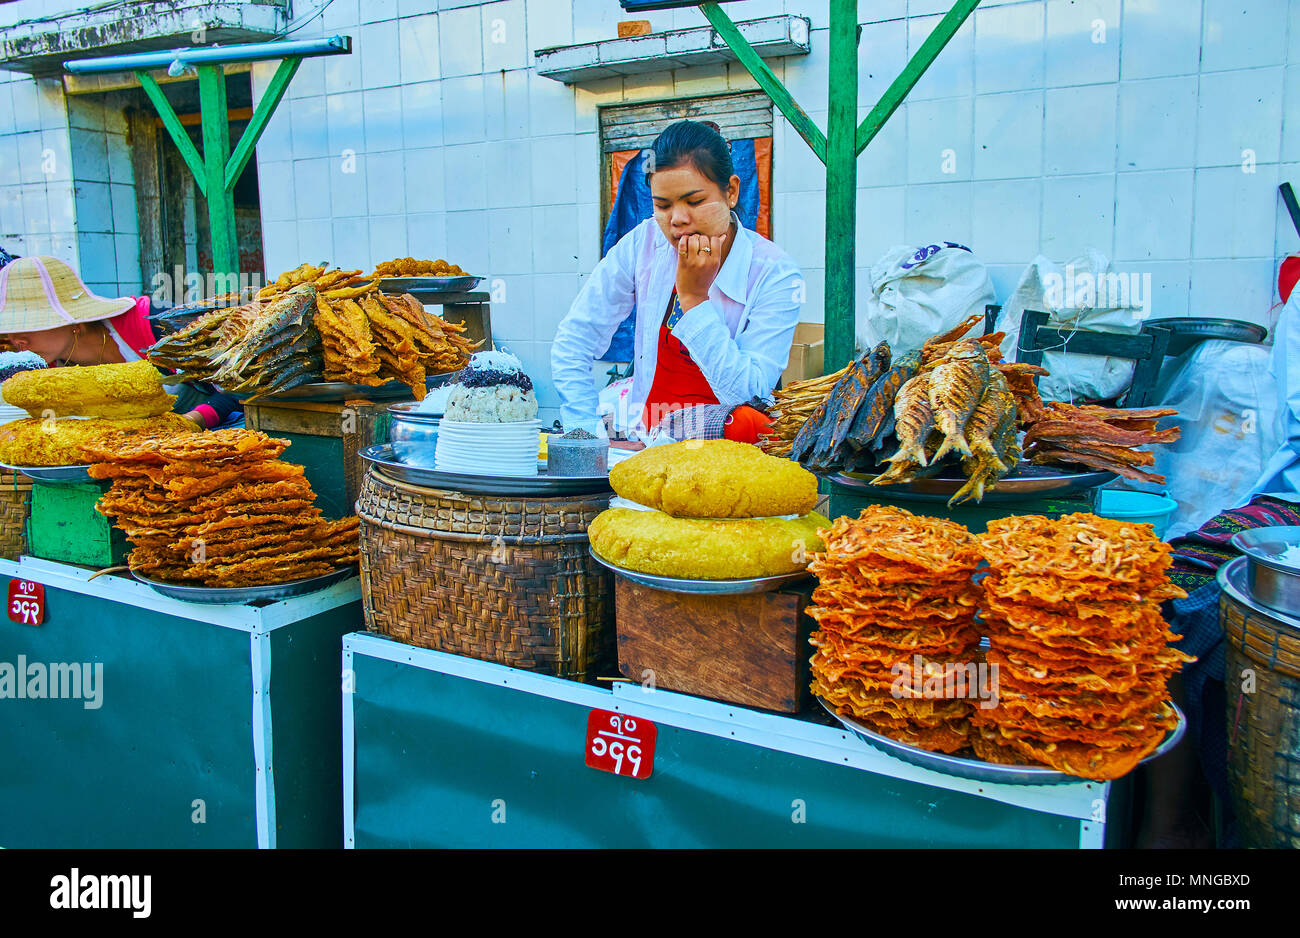 675c5a4d4f9e Mon Food Immagini   Mon Food Fotos Stock - Alamy